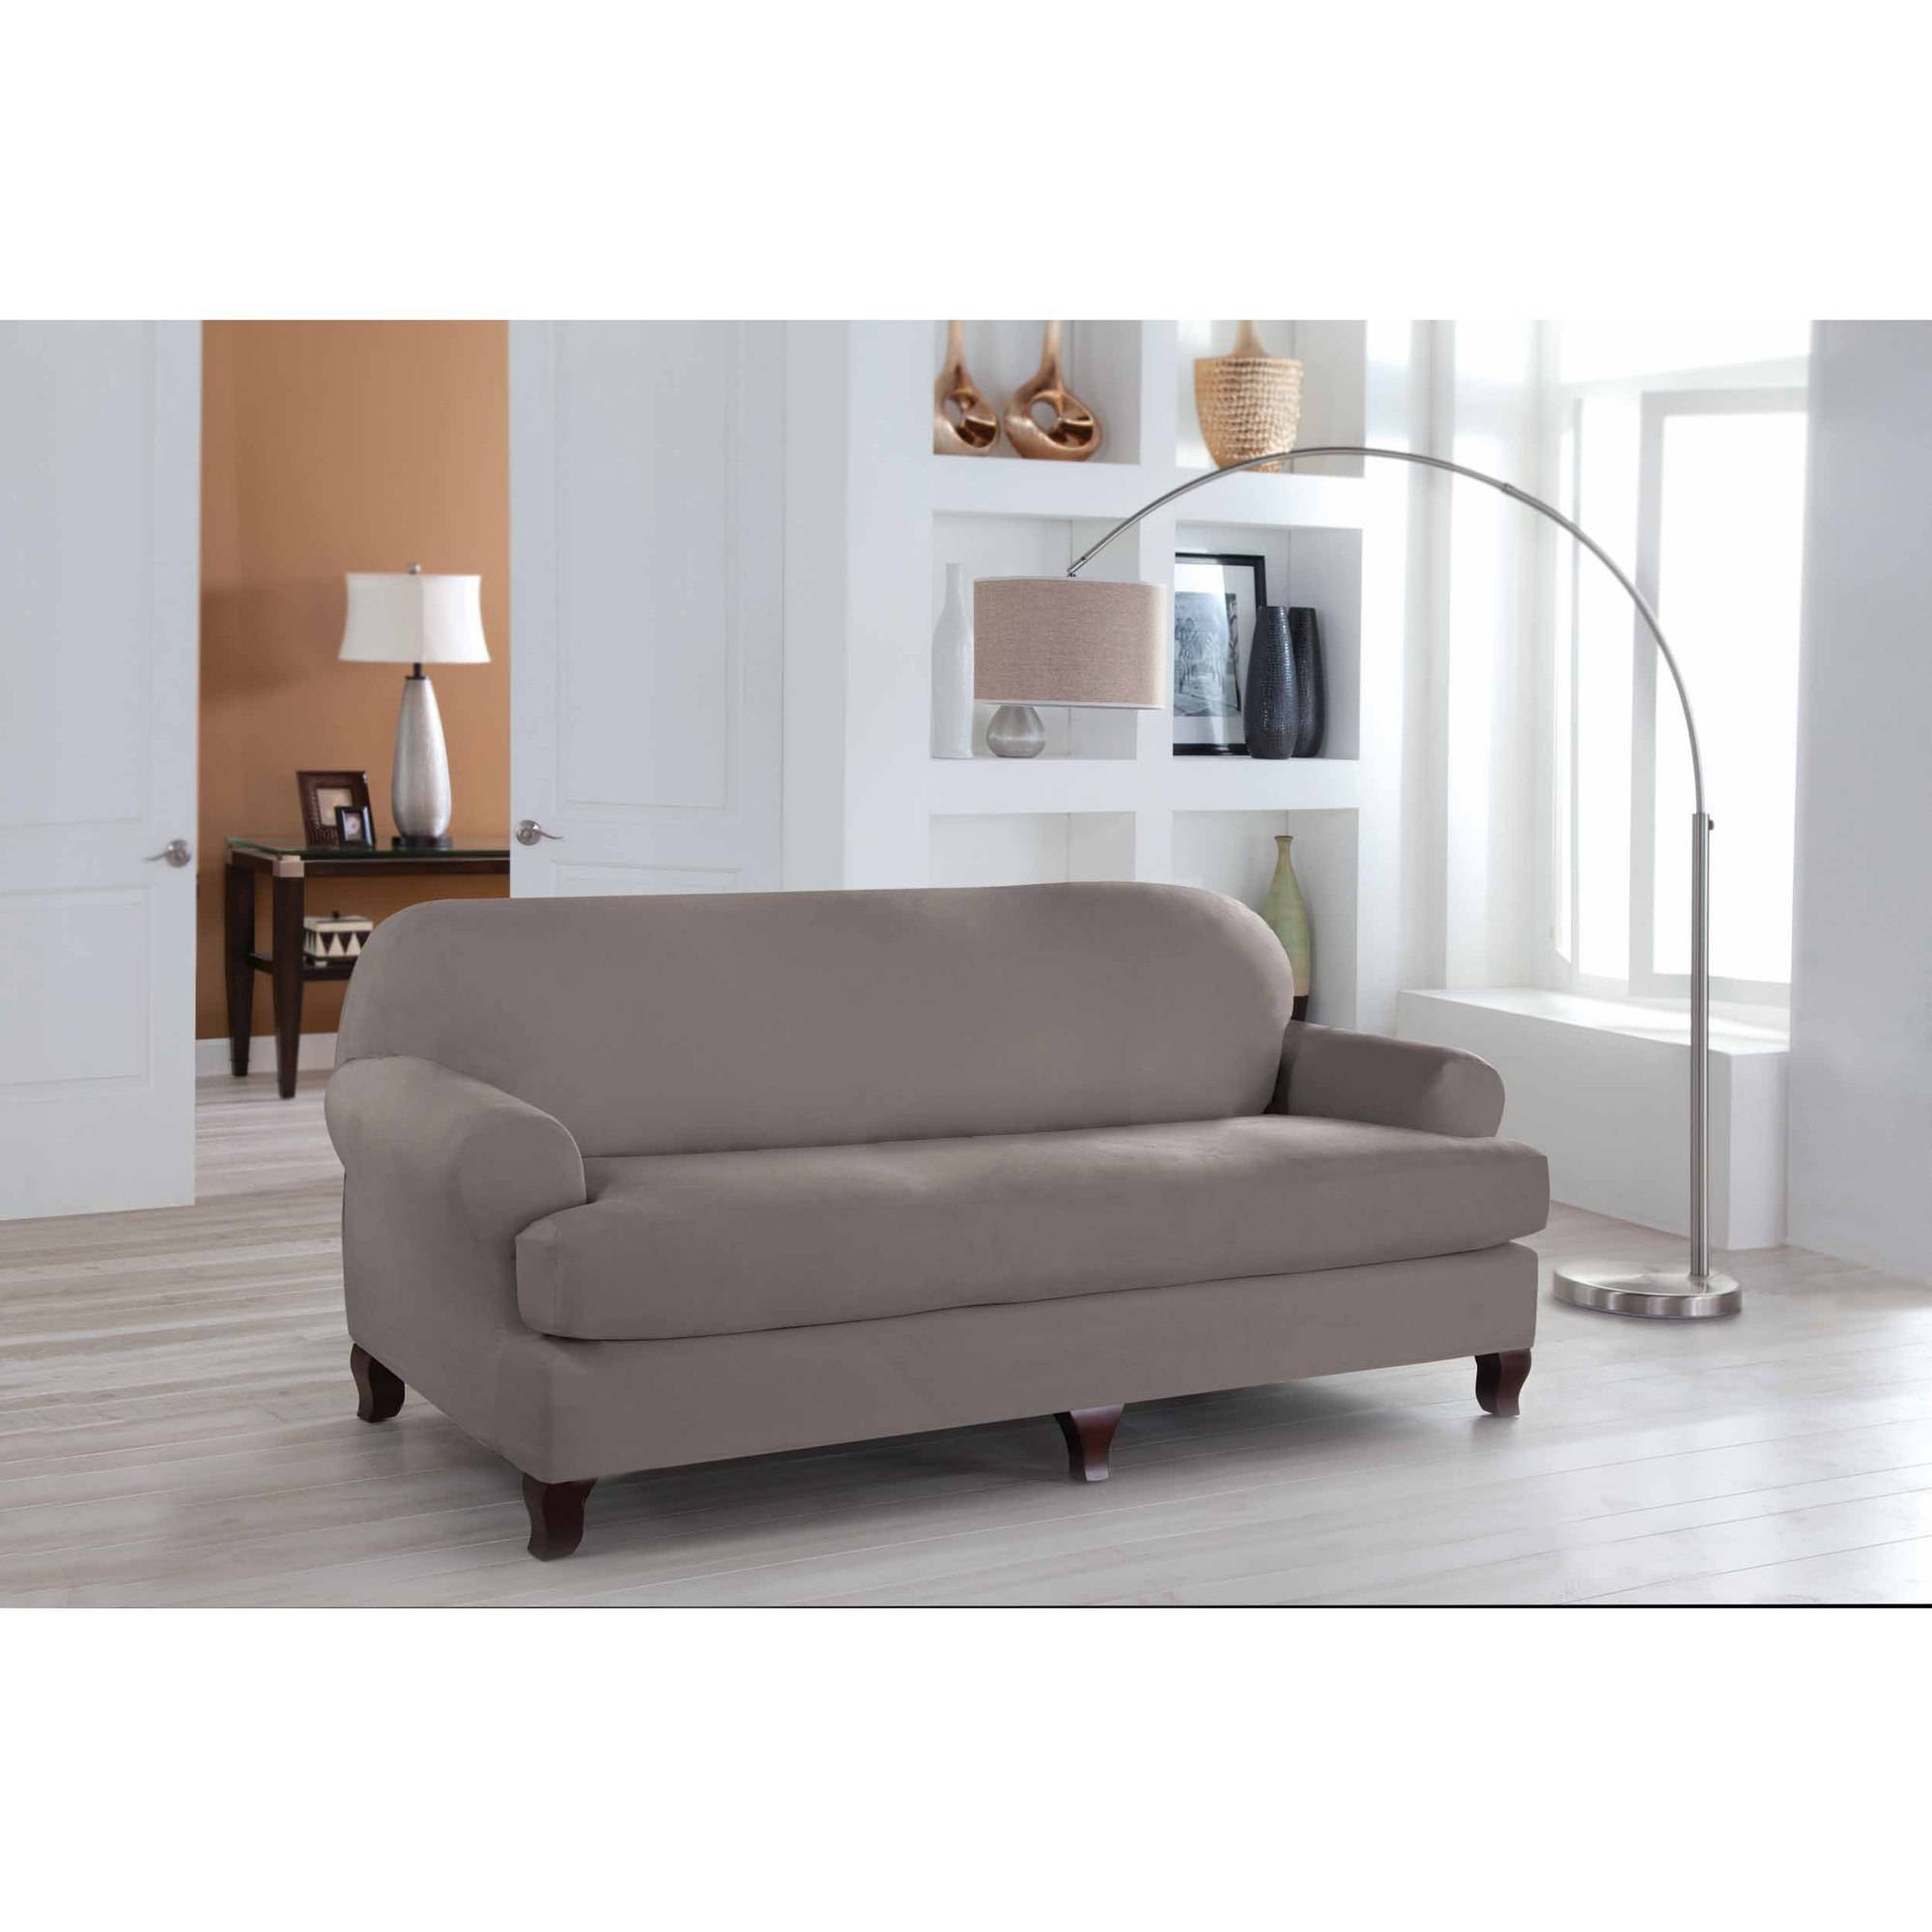 Serta Stretch Fit Microsuede Slipcover, Sofa, 2-Piece T Cushion -  Walmart